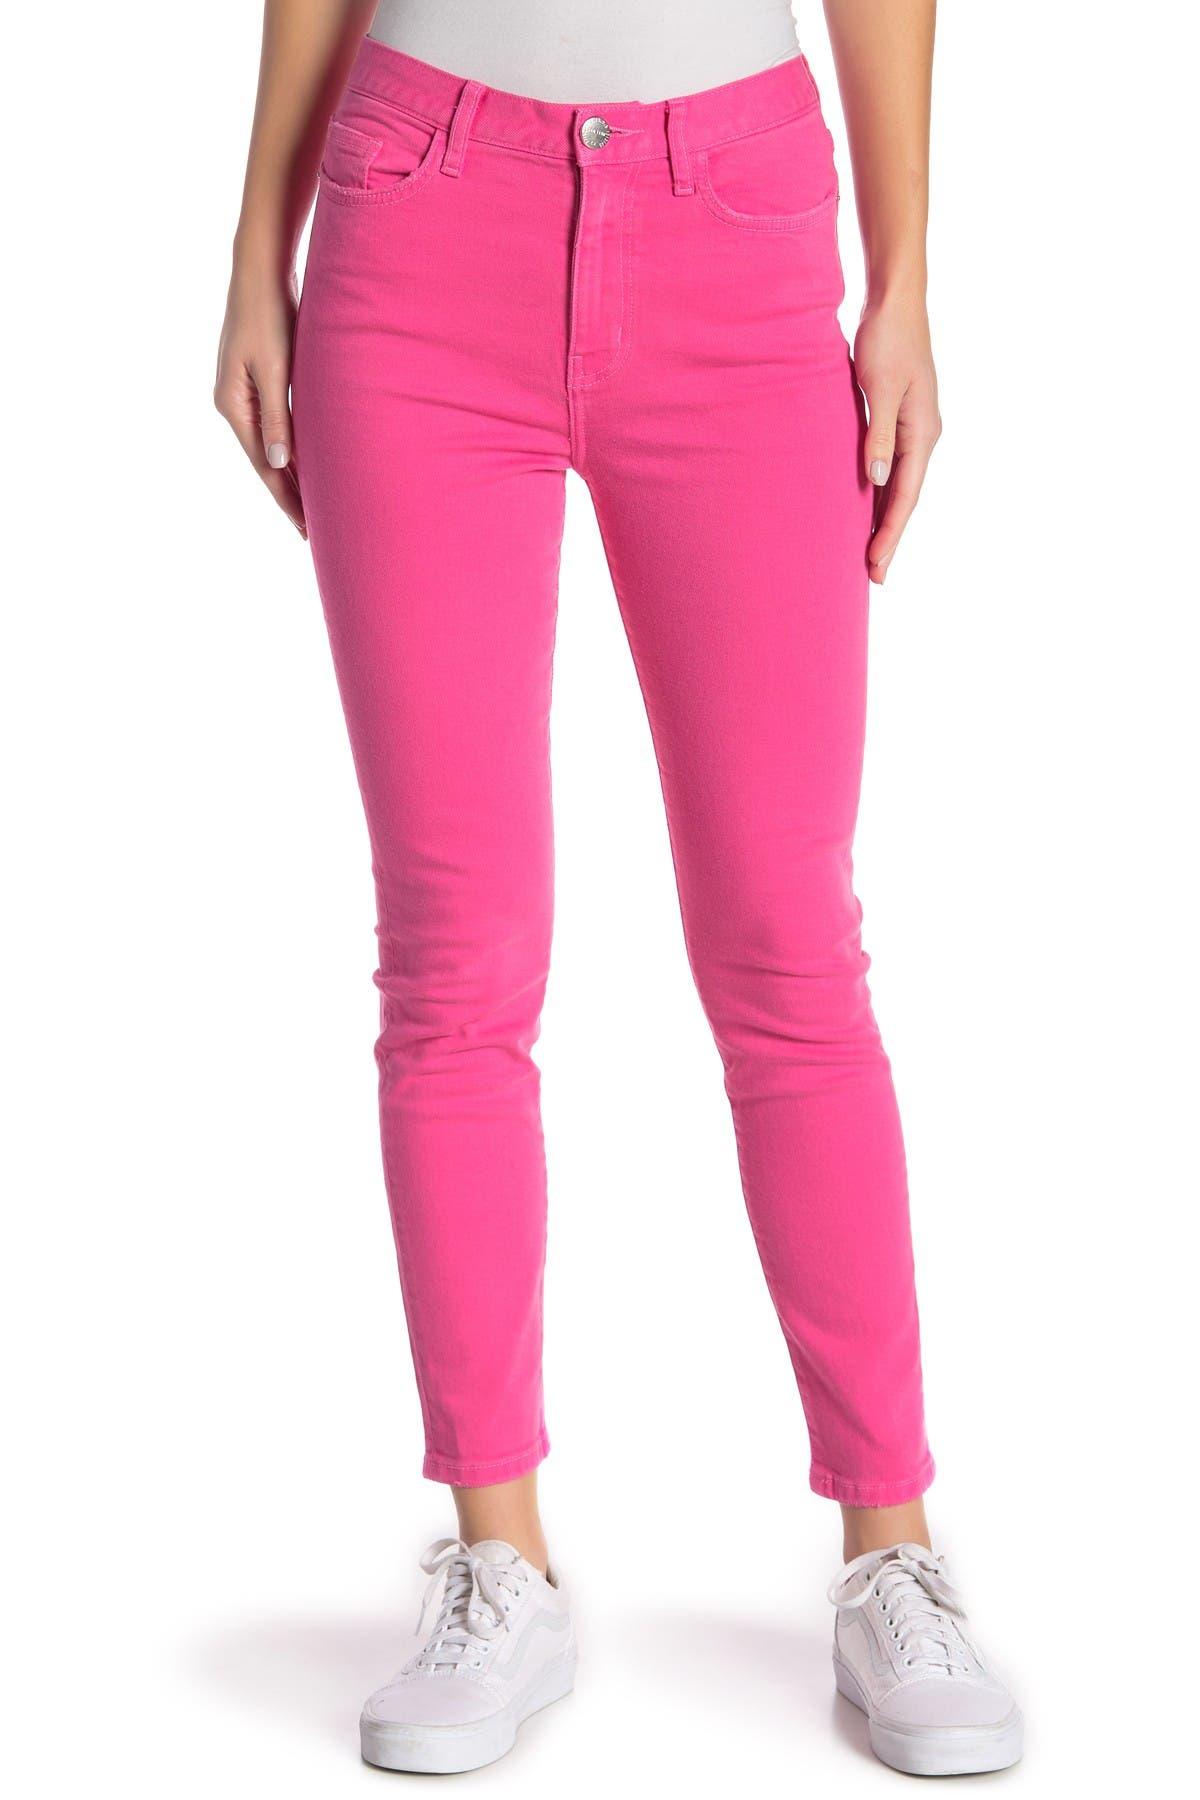 Image of Current/Elliott The Ultra High Waist Skinny Jeans